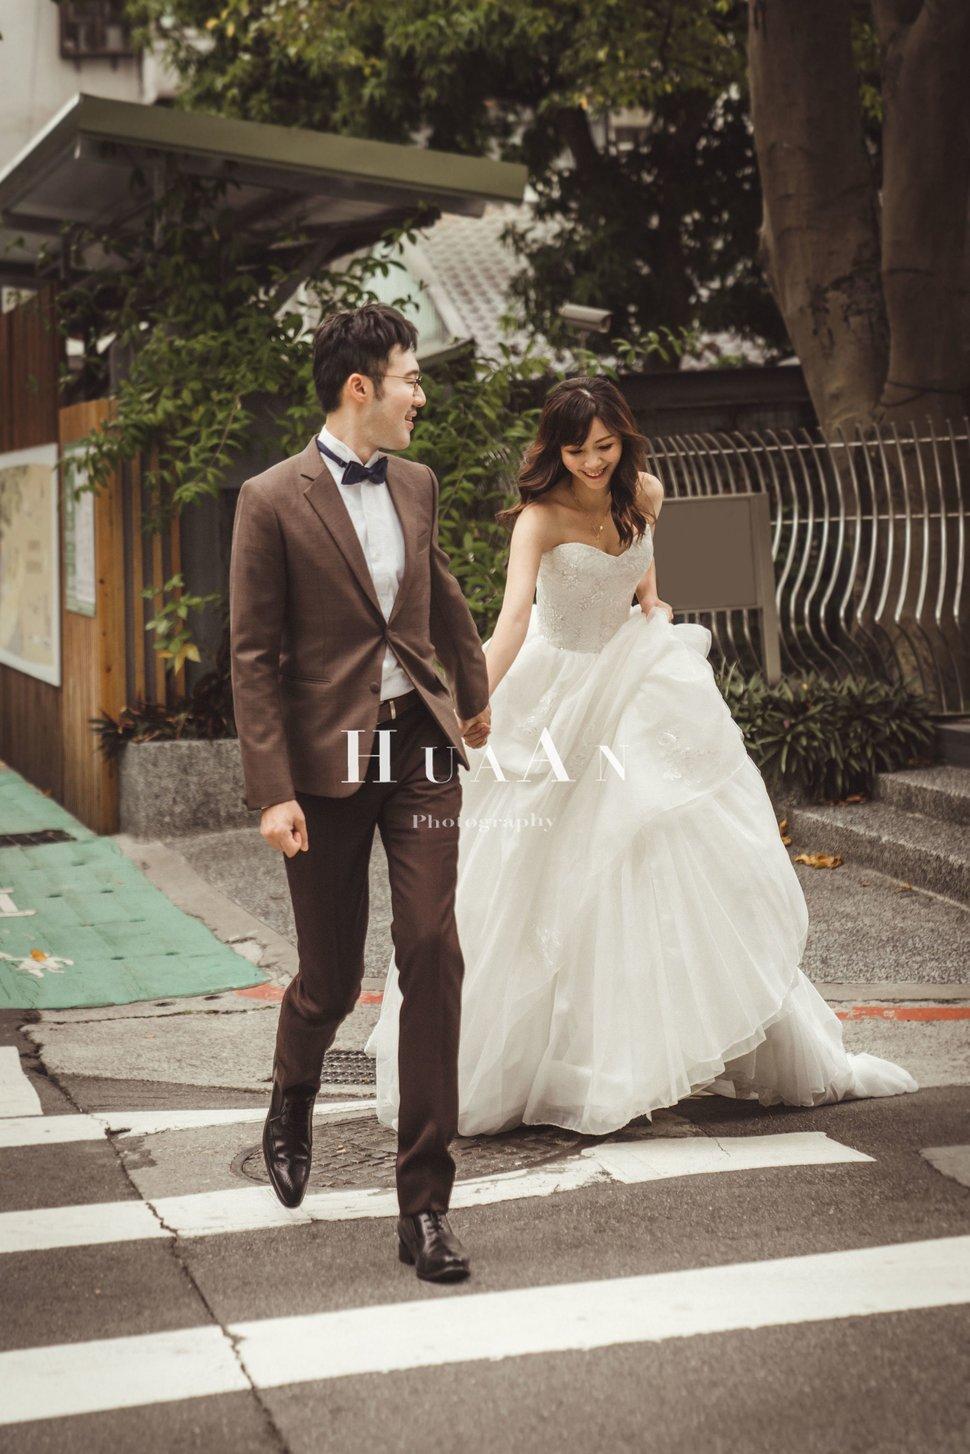 HUA00868 - Huaan Photography《結婚吧》